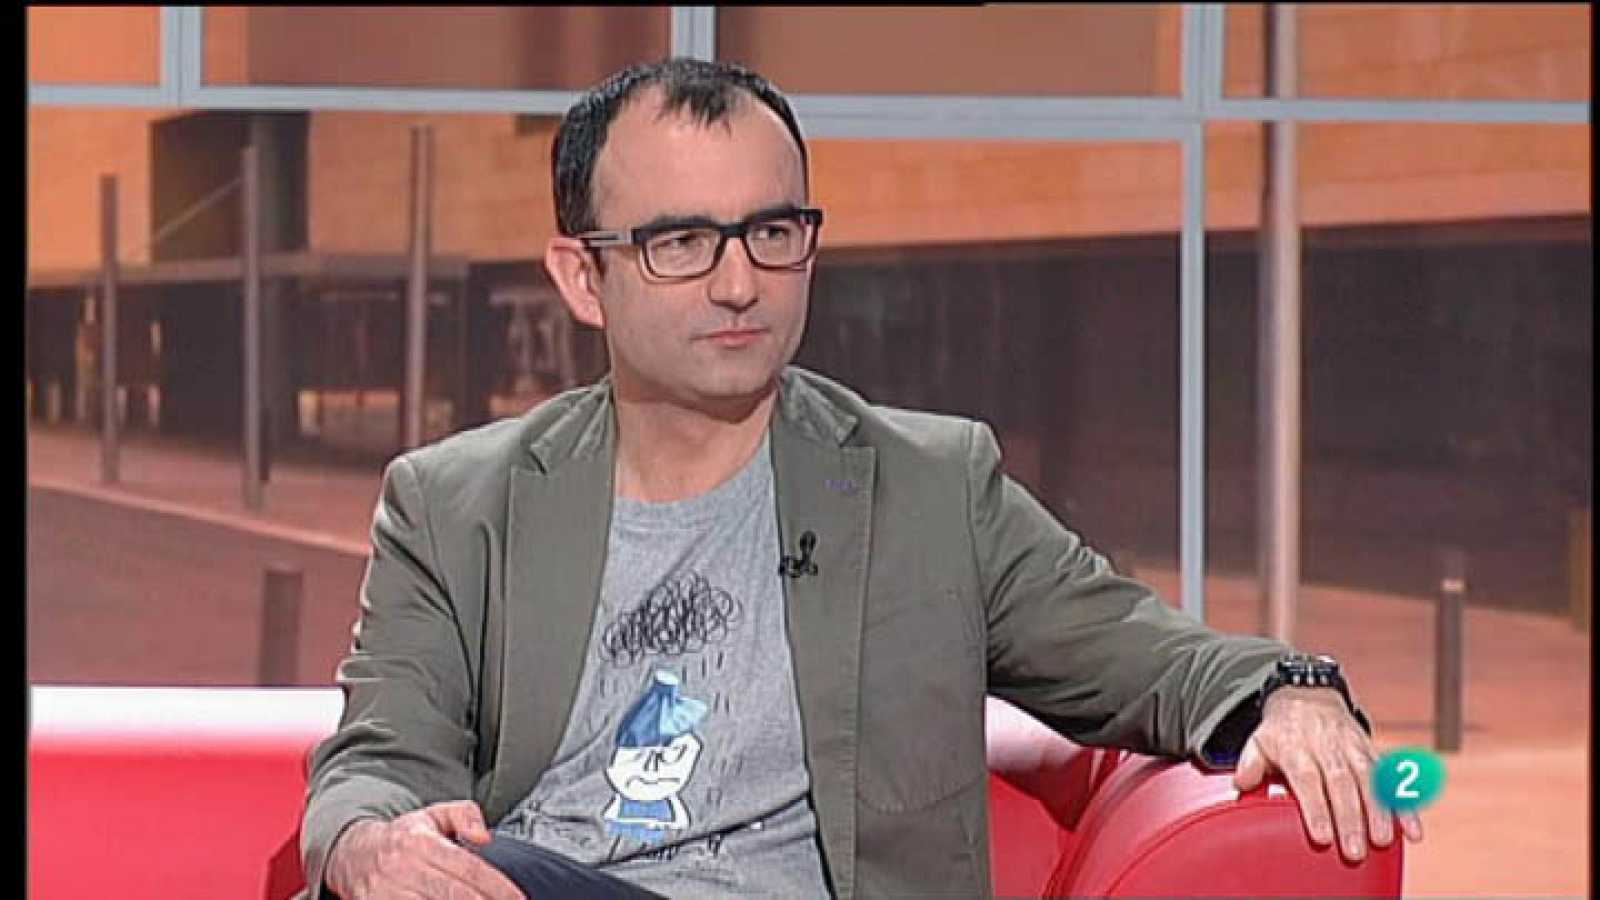 Para Todos La 2 -  Entrevista Rafael Santandreu, la psicologia cognitiva